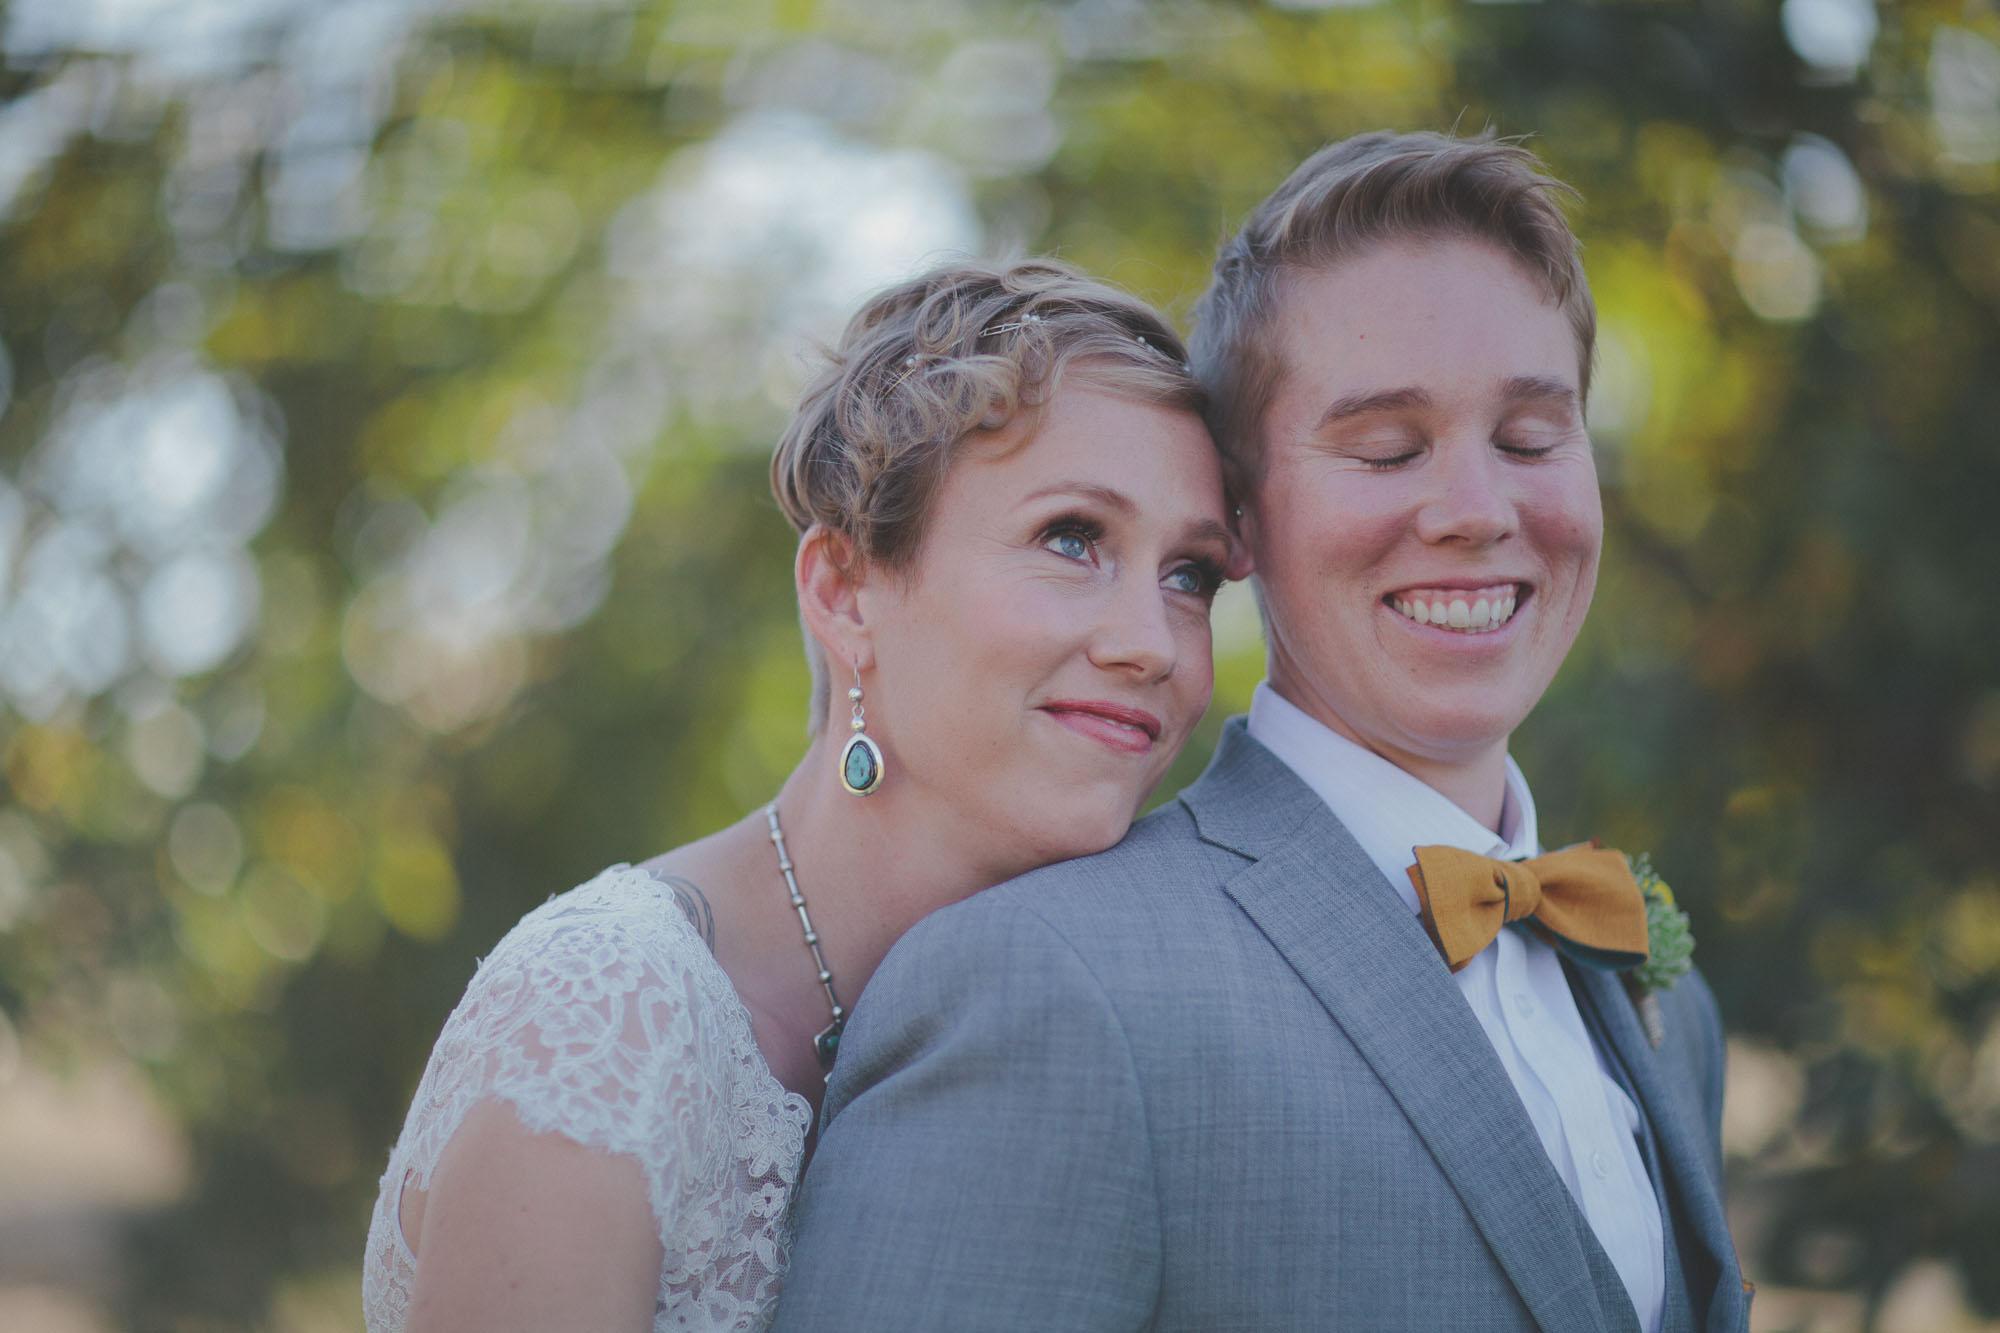 Gretchen_Gause_Petaluma_Olympias_Valley_Wedding_Photo-103.jpg